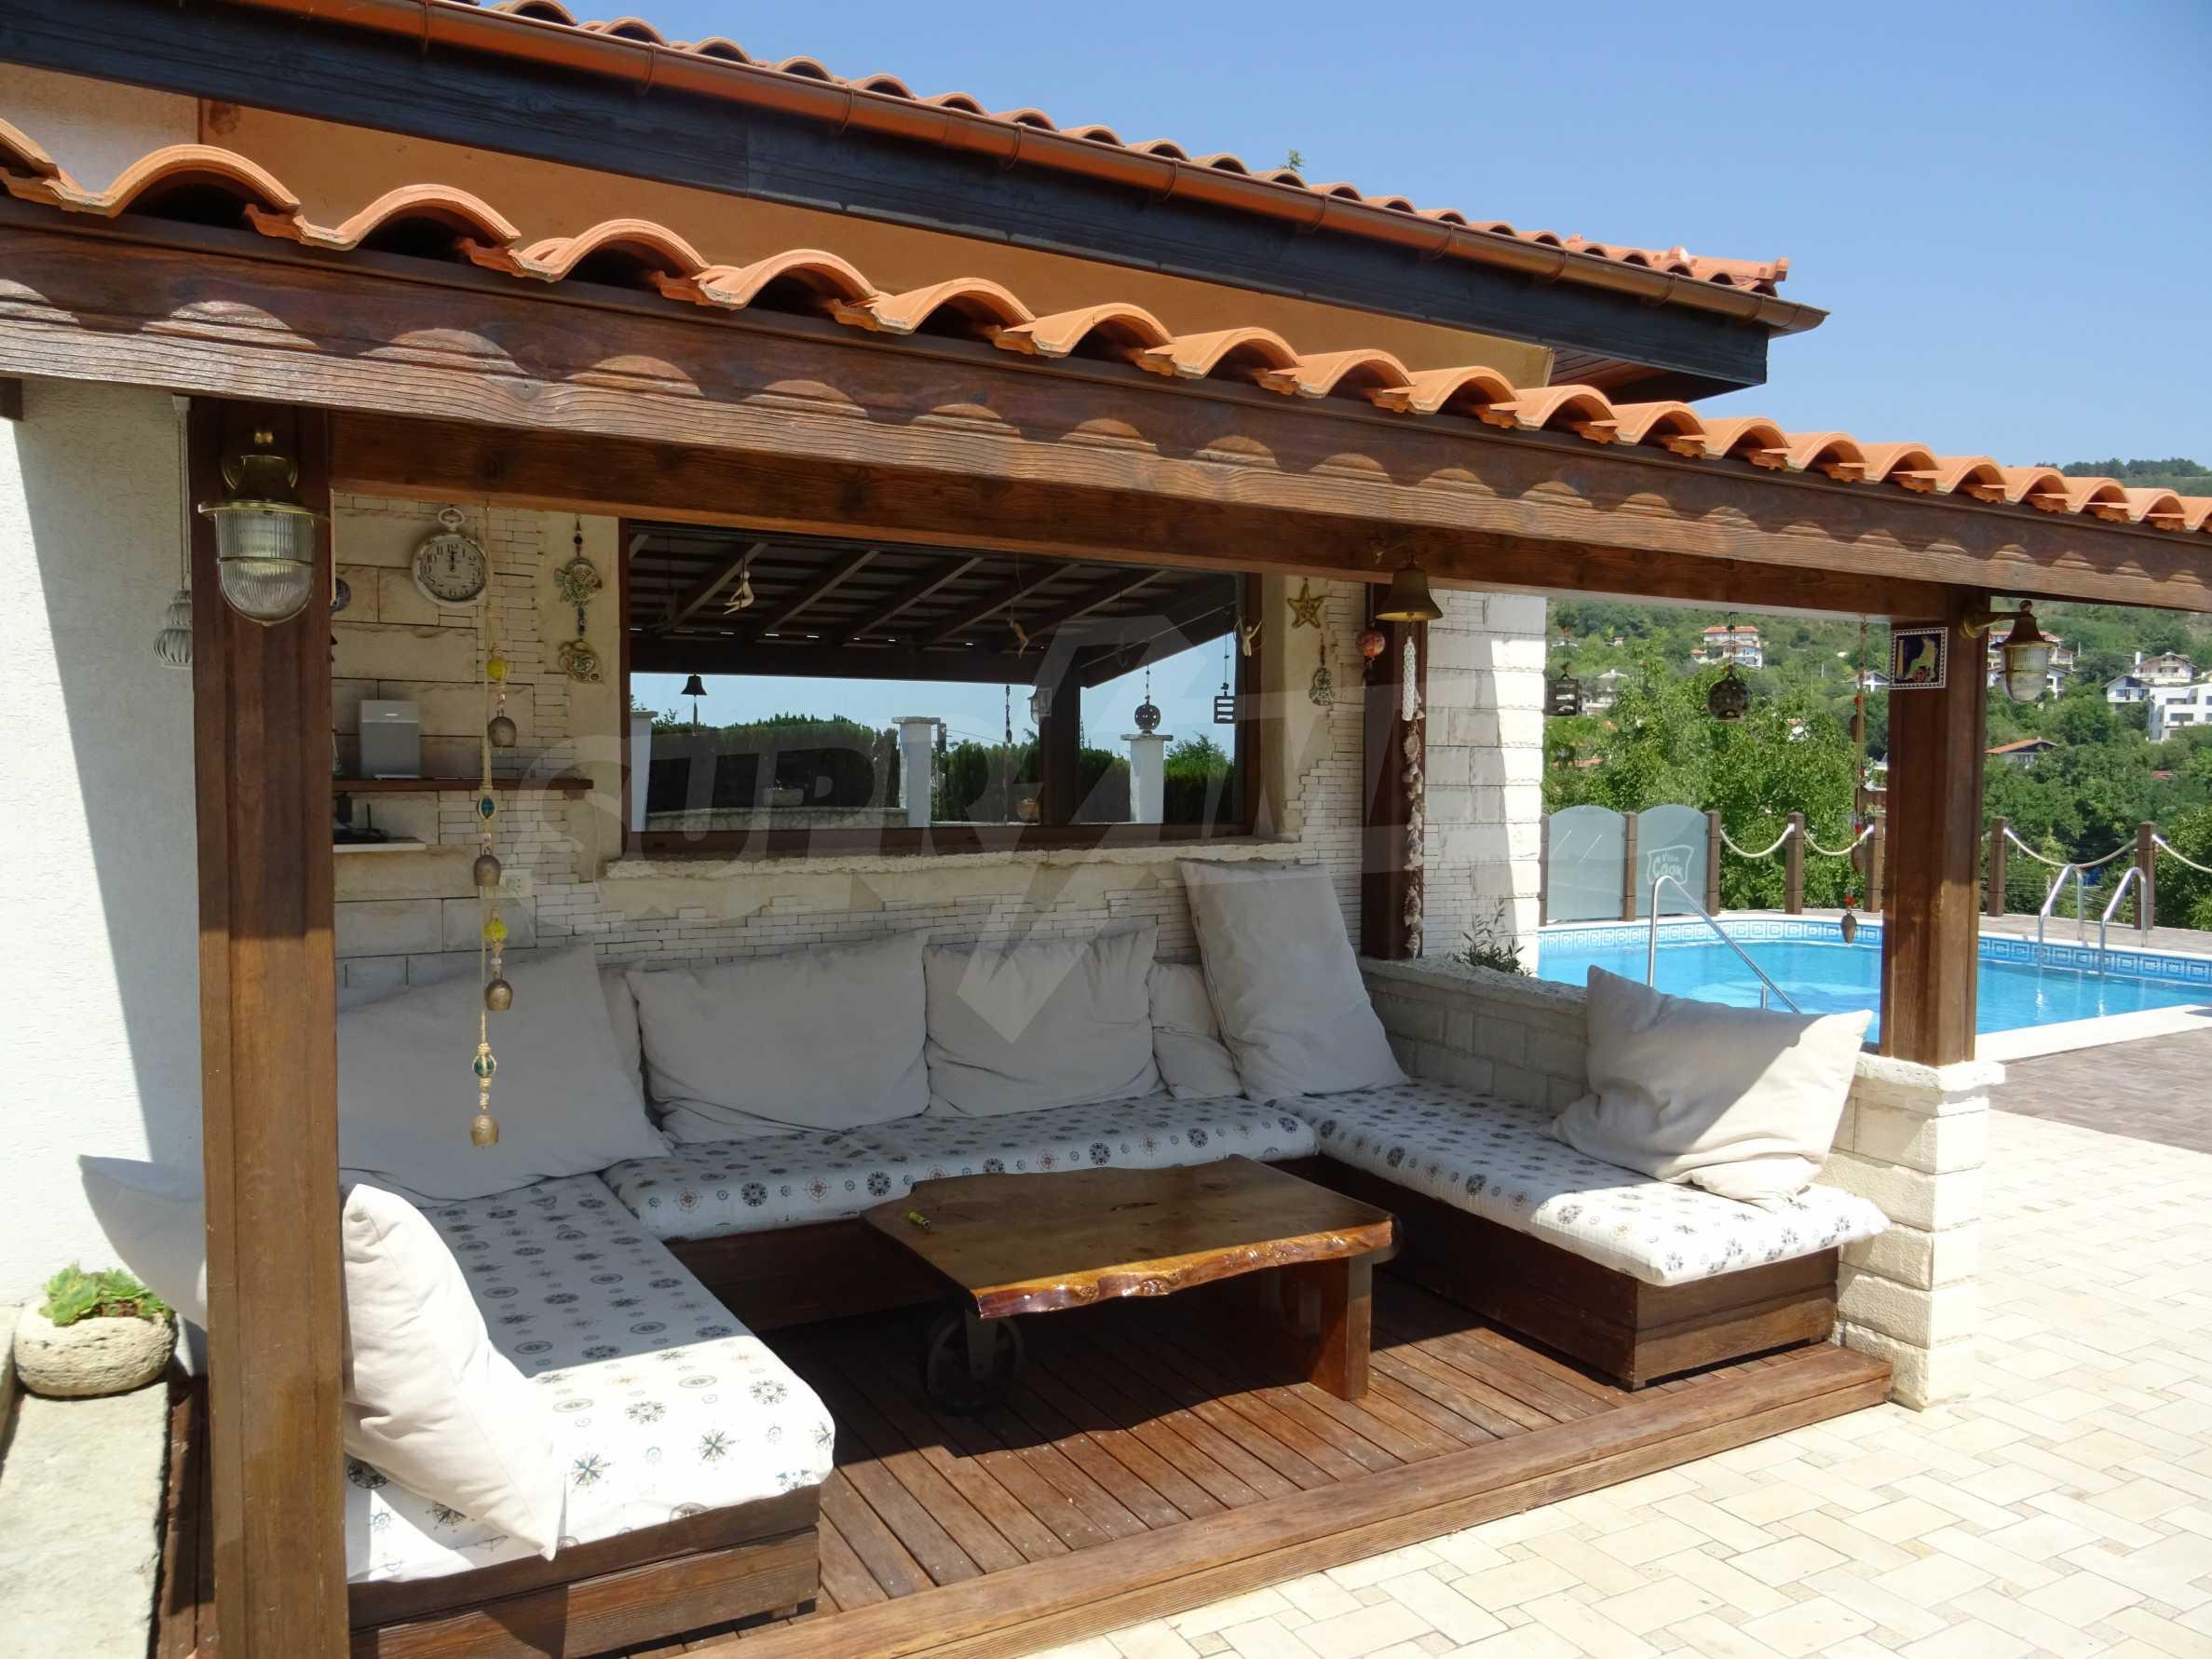 The Mediterranean style - a sense of luxury 3